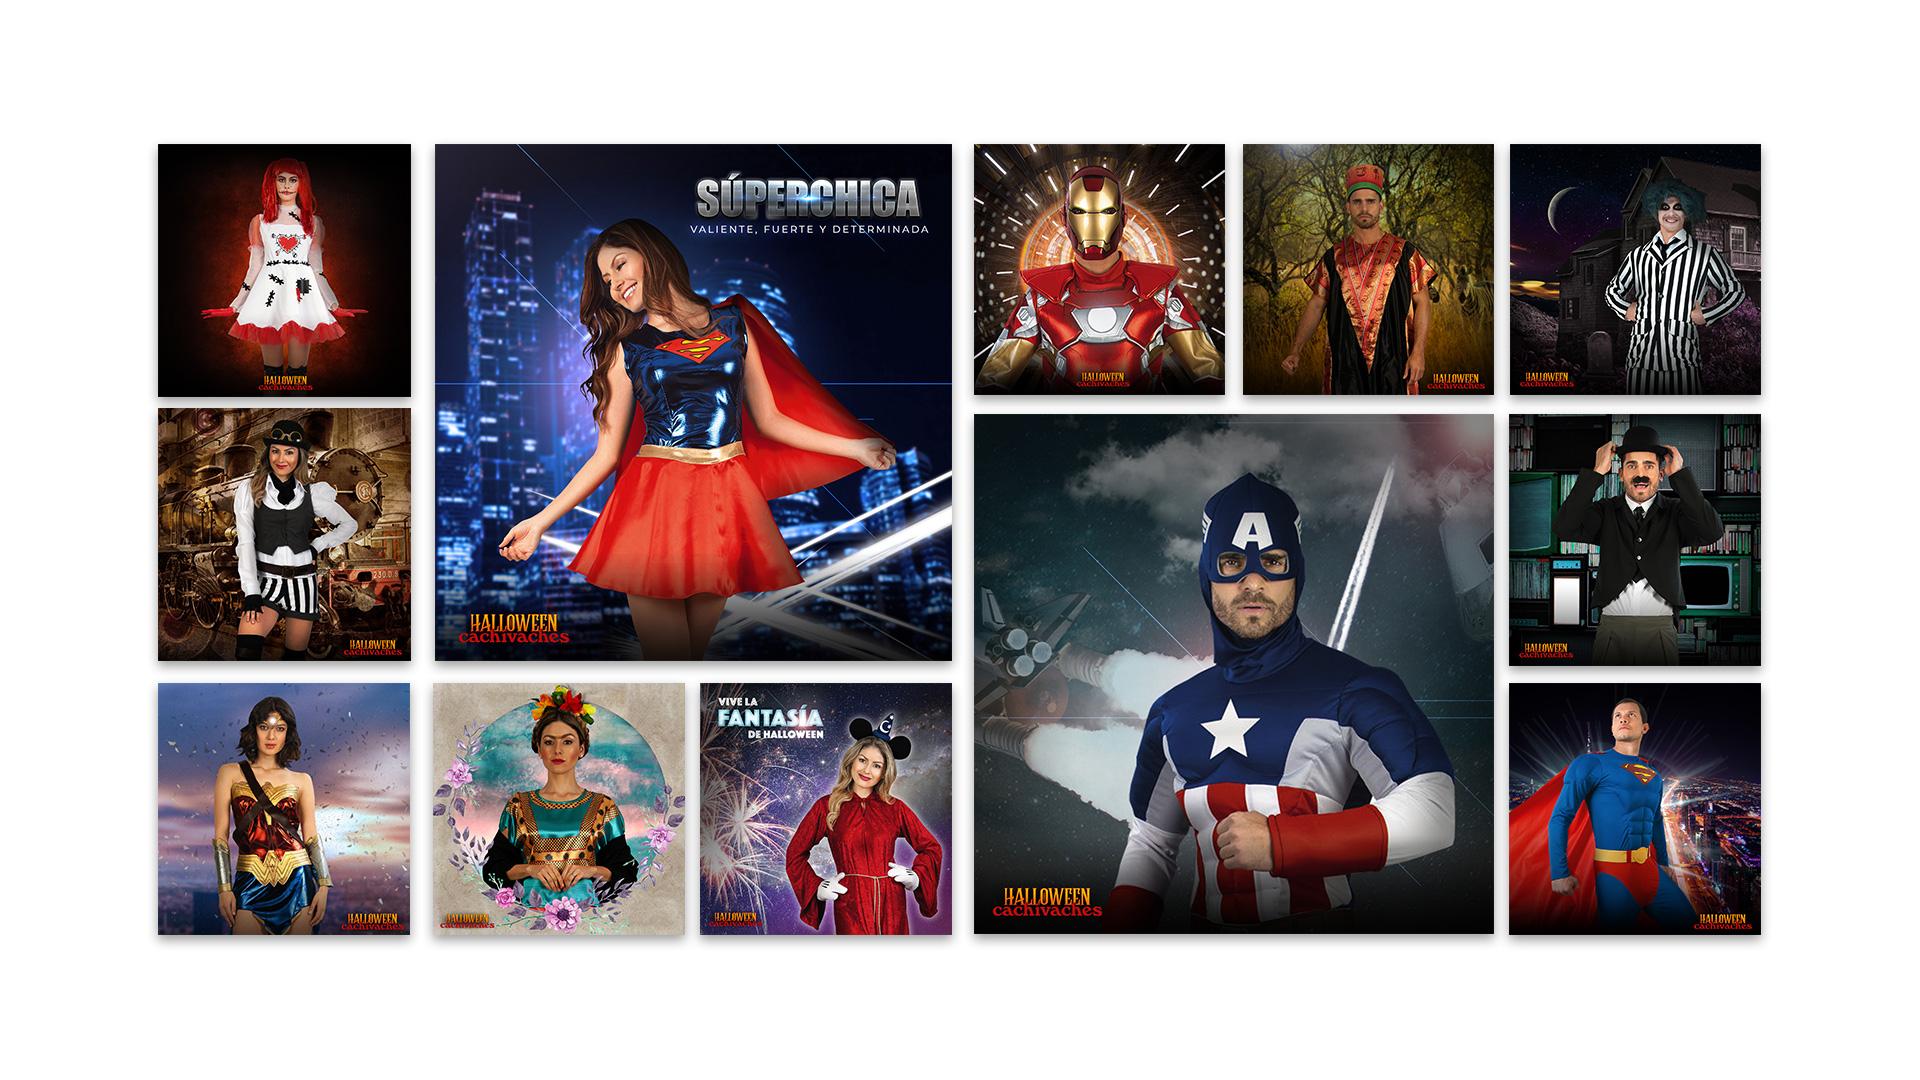 CACHIVACHES-COSTUMES-HALLOWEEN-SOCIAL-MEDIA-SUPER-HERO-SEASON-ADWORDS-FACEBOOK-INSTAGRAM